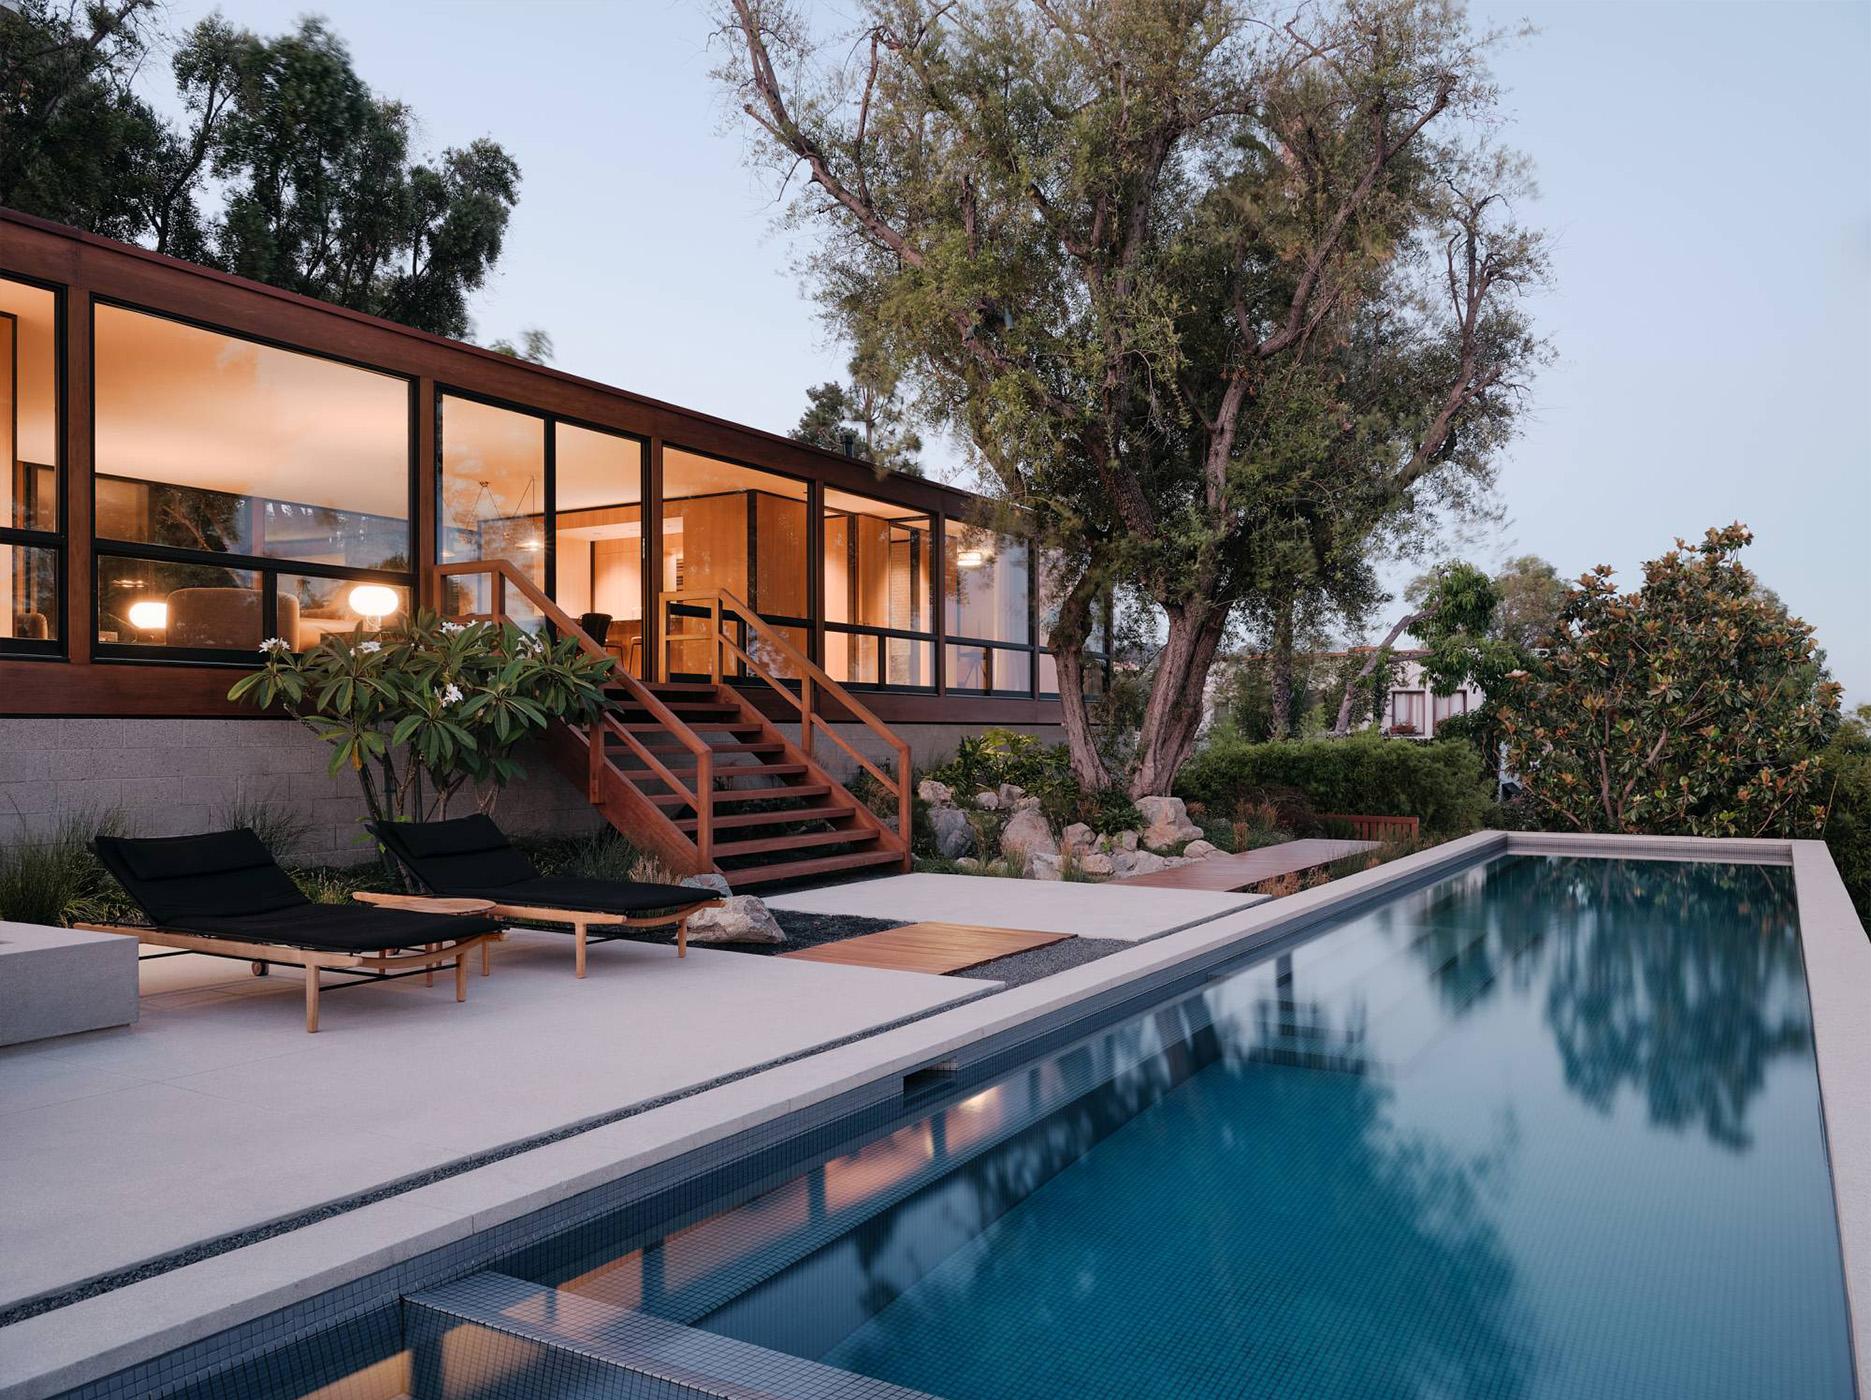 Moore-House-Restoration-Overgaard-Dyrman